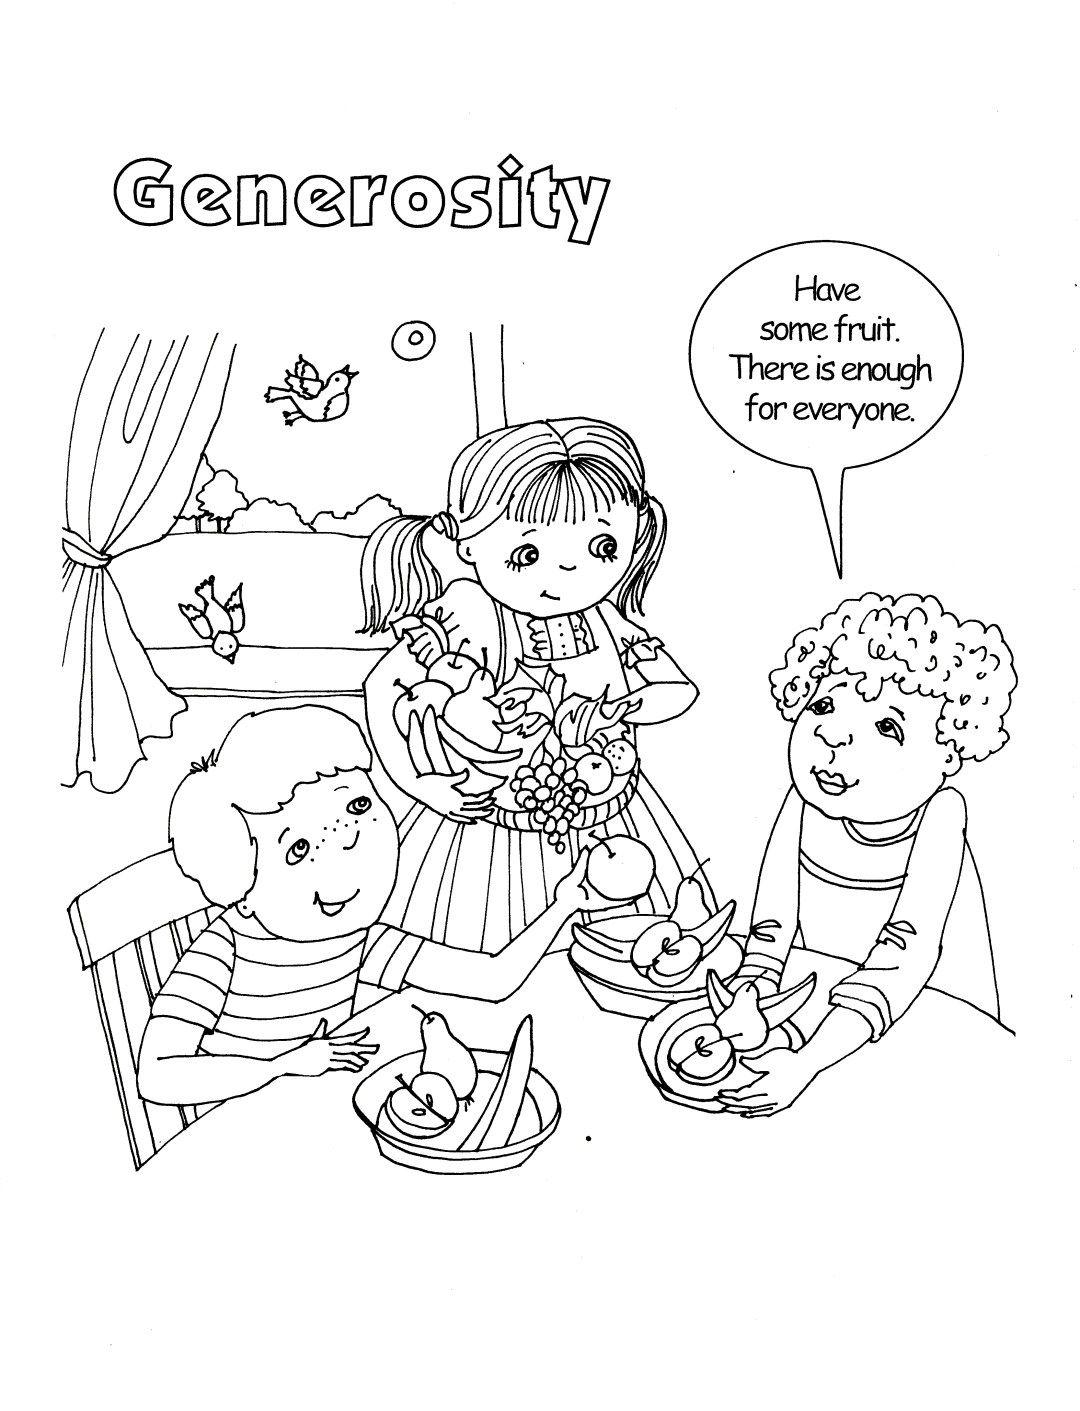 Generosity Coloring Sheet